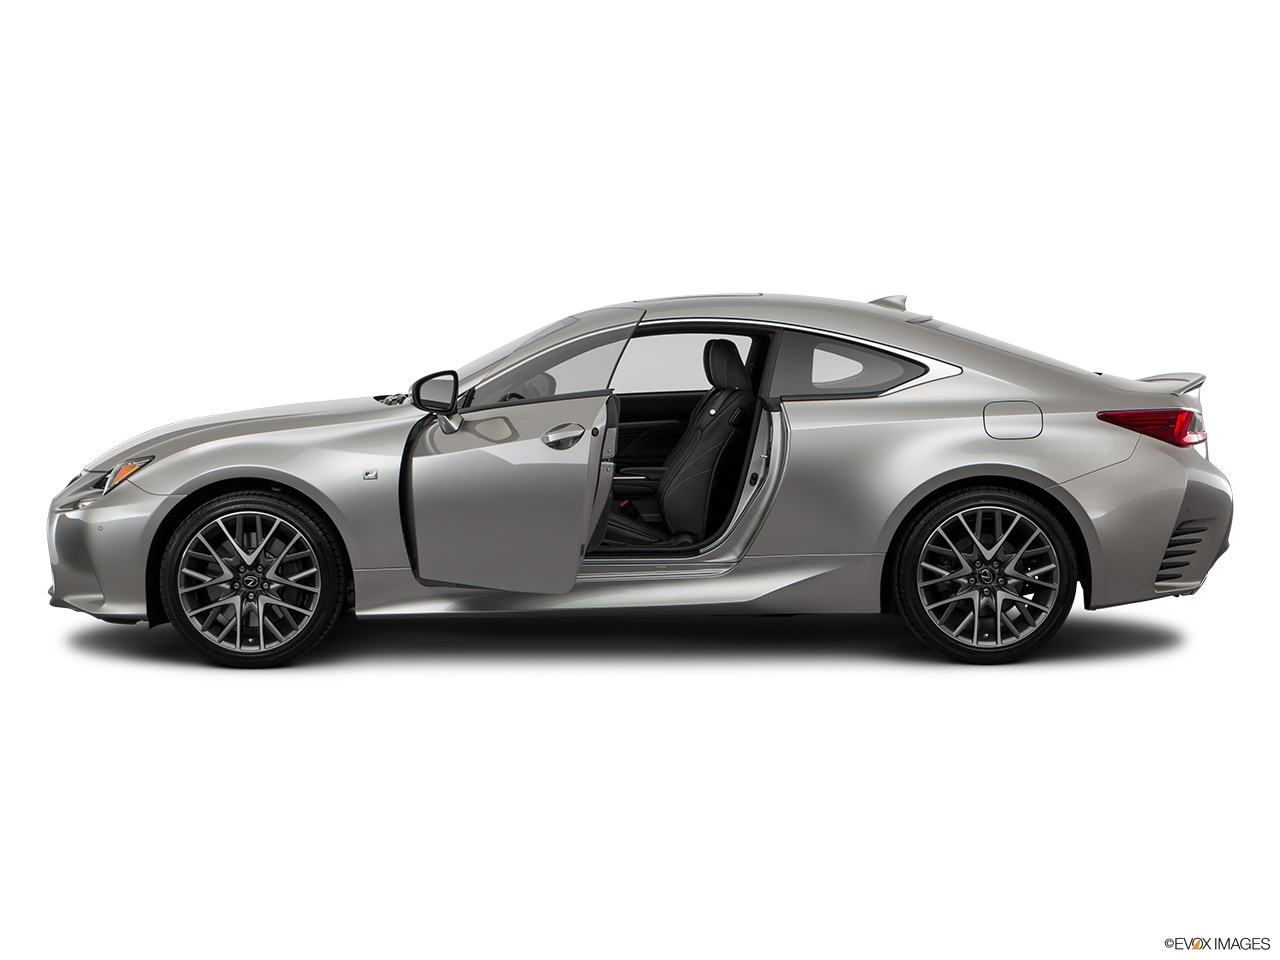 lexus rc 2017 350 f sport platinum in bahrain new car prices specs reviews photos yallamotor. Black Bedroom Furniture Sets. Home Design Ideas